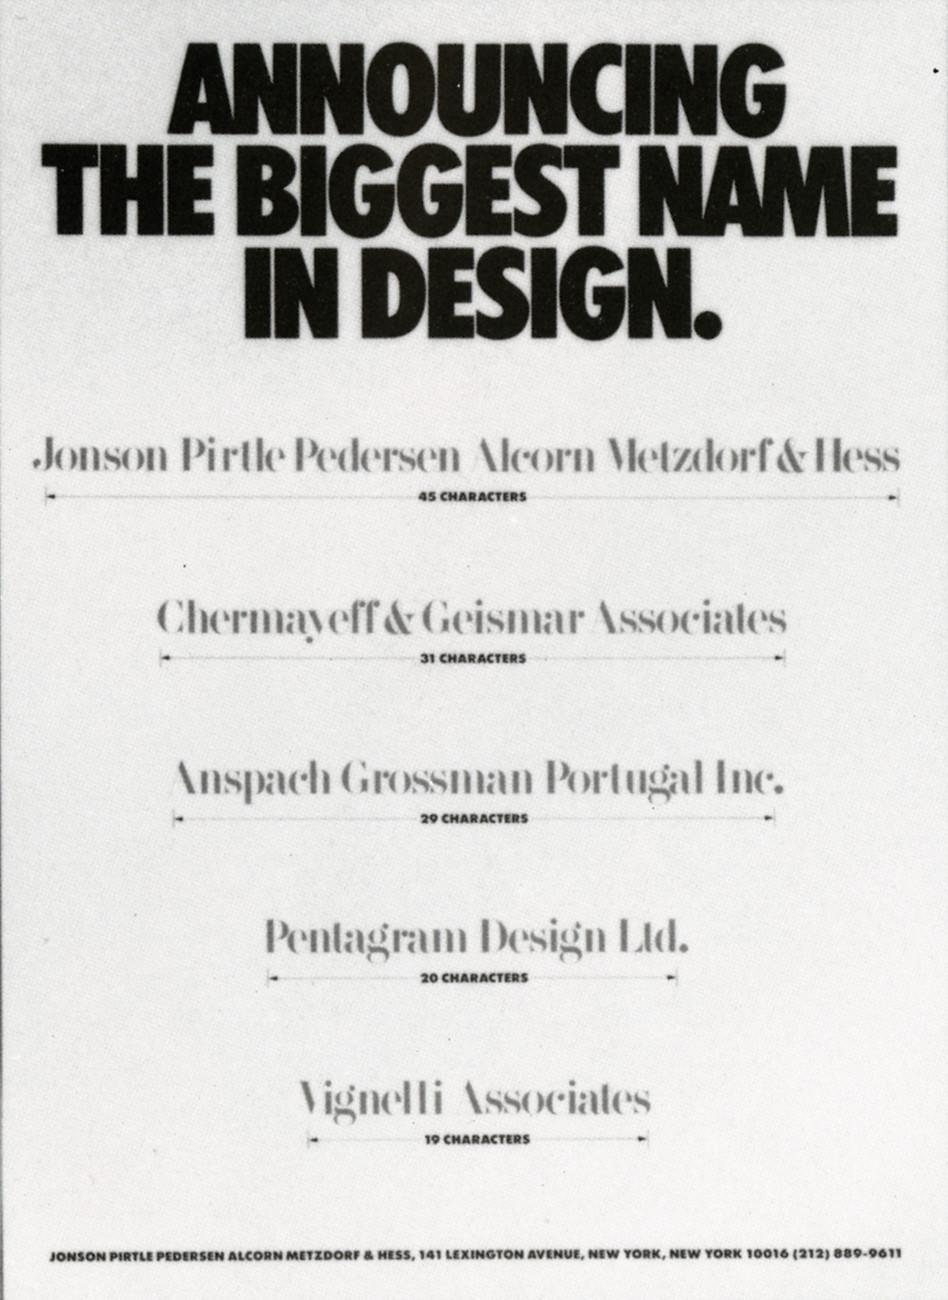 Announcing the Biggest Name in Graphic Design: Jonson Pirtle Pedersen Alcorn Metzdorf & Hess, New York, New York, 1986